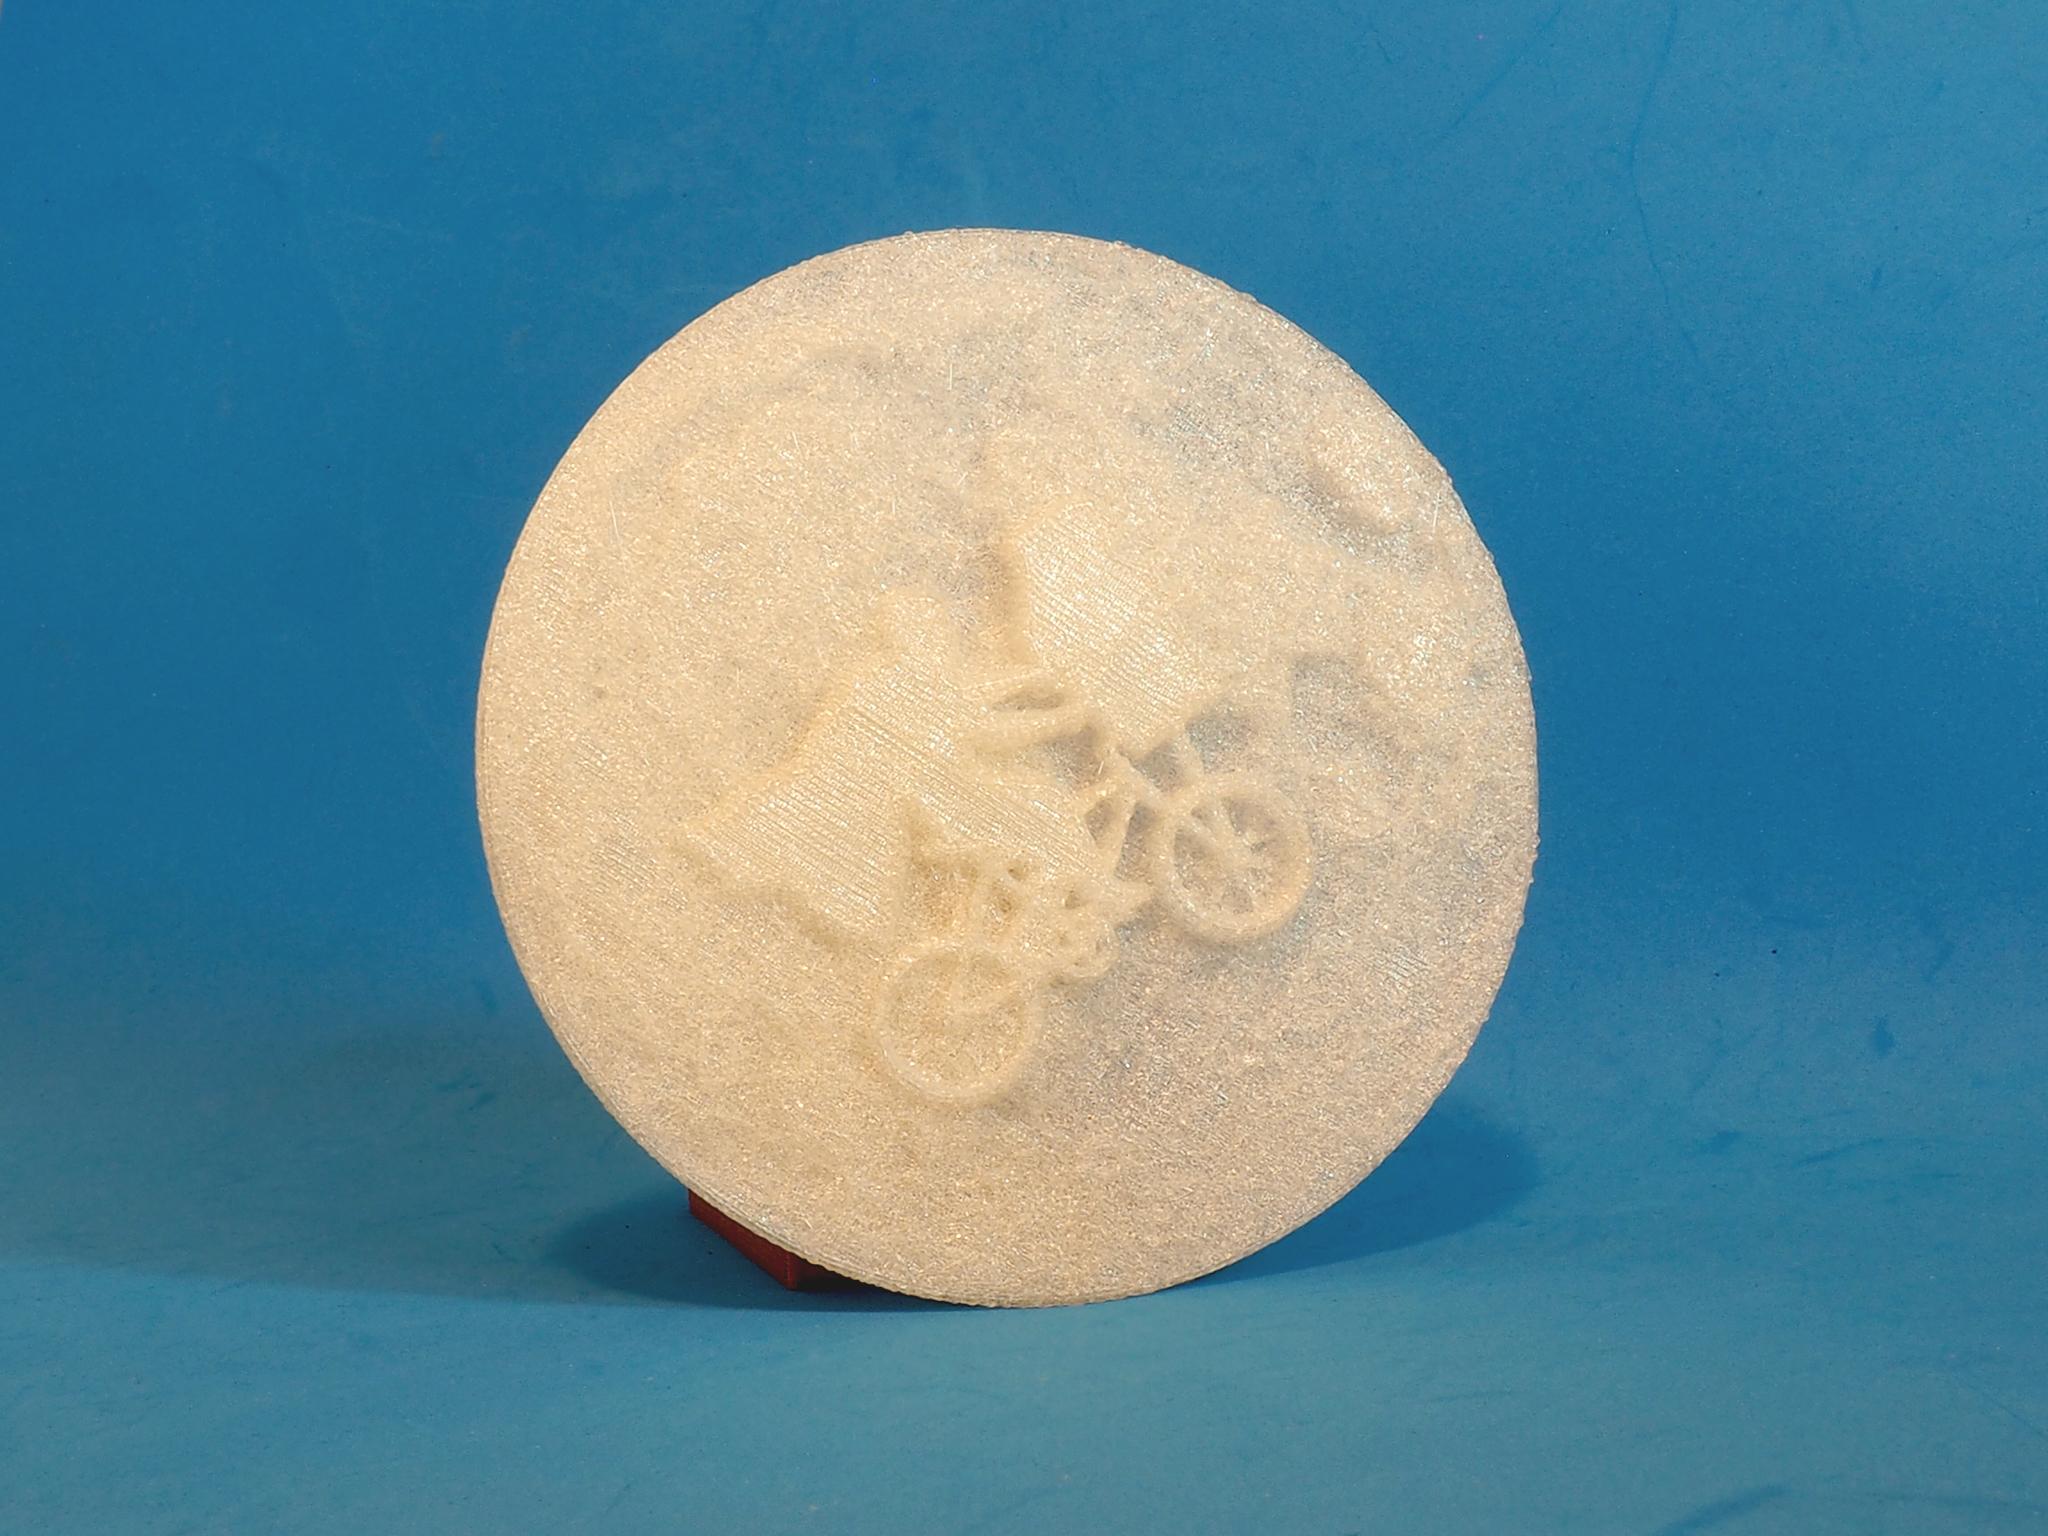 foto2.jpg Download free STL file E.T. across the moon litophane • 3D print template, dancingchicken